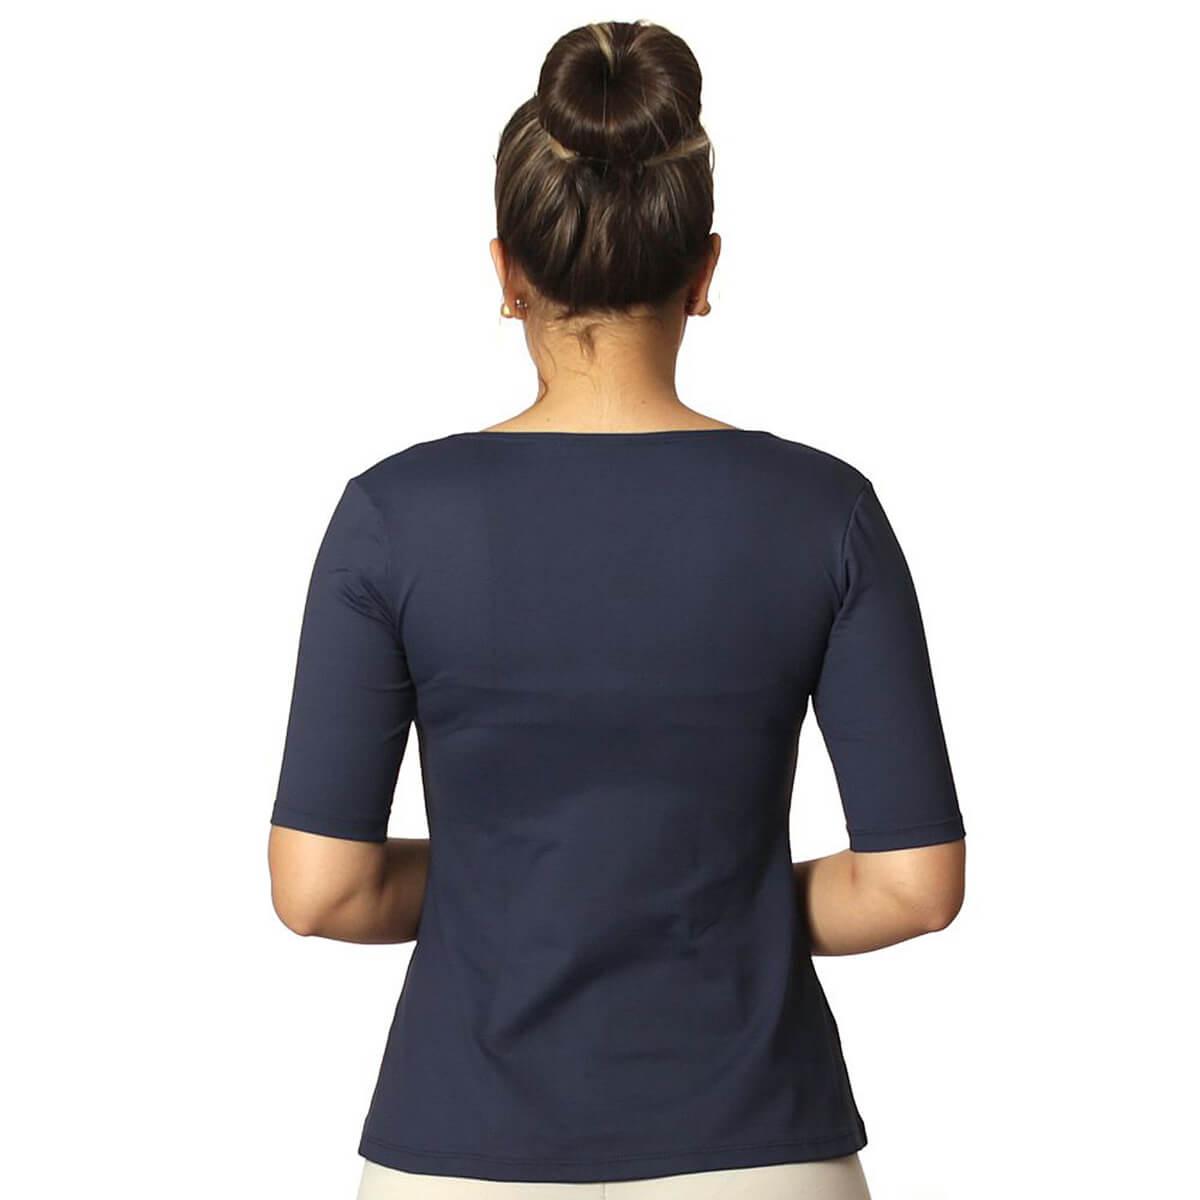 Blusa Feminina Meia Manga Azul Marinho Decote Redondo Evasê